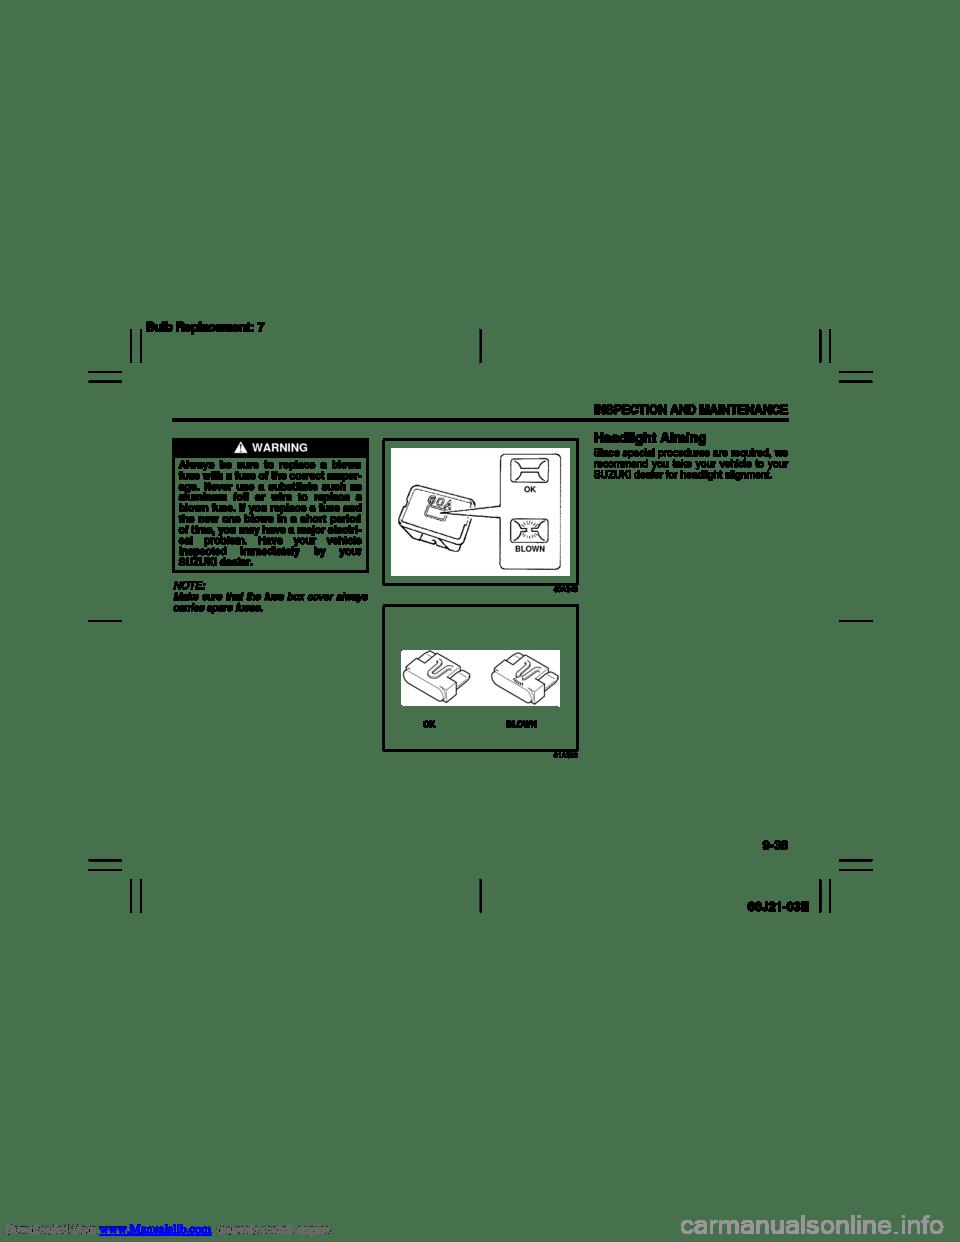 medium resolution of suzuki grand vitara 2007 3 g owners manual page 176